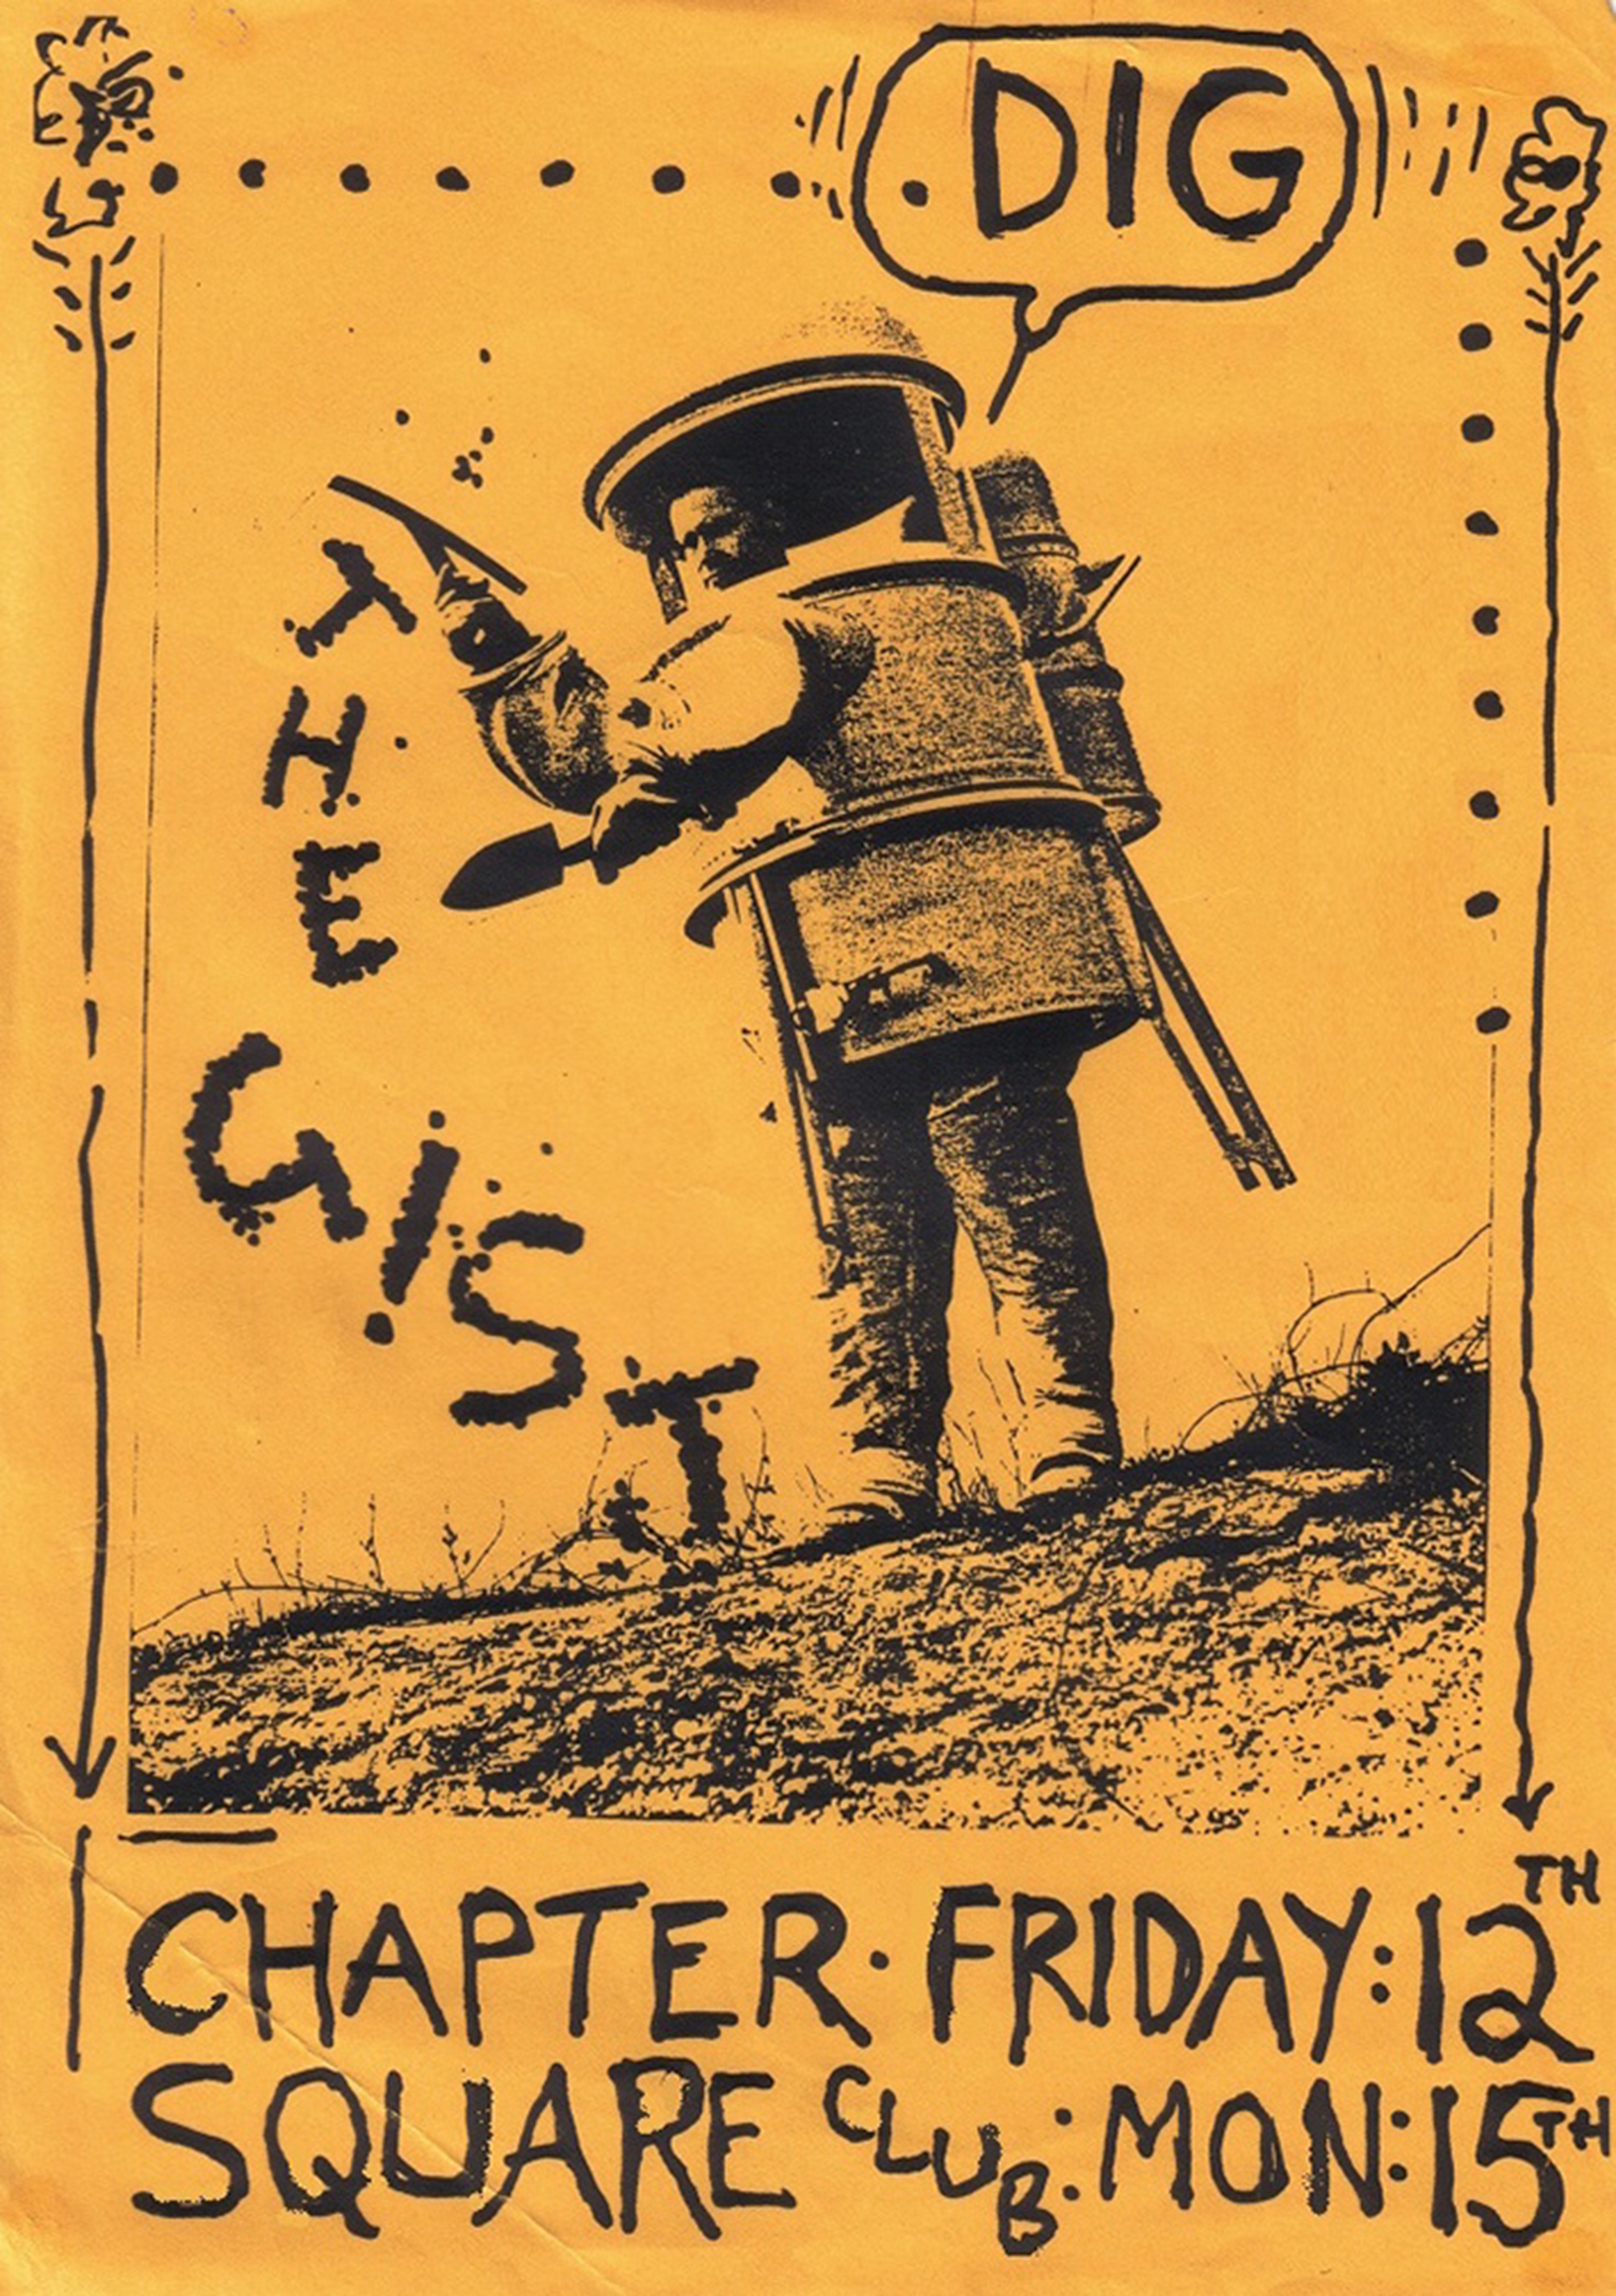 THE G!ST gig poster for Chapter Arts Centre and the Square Club (1984) - Image courtesy of Stuart Moxham for Homesick Magazine Issue #1   www.stuartmoxham.co.uk